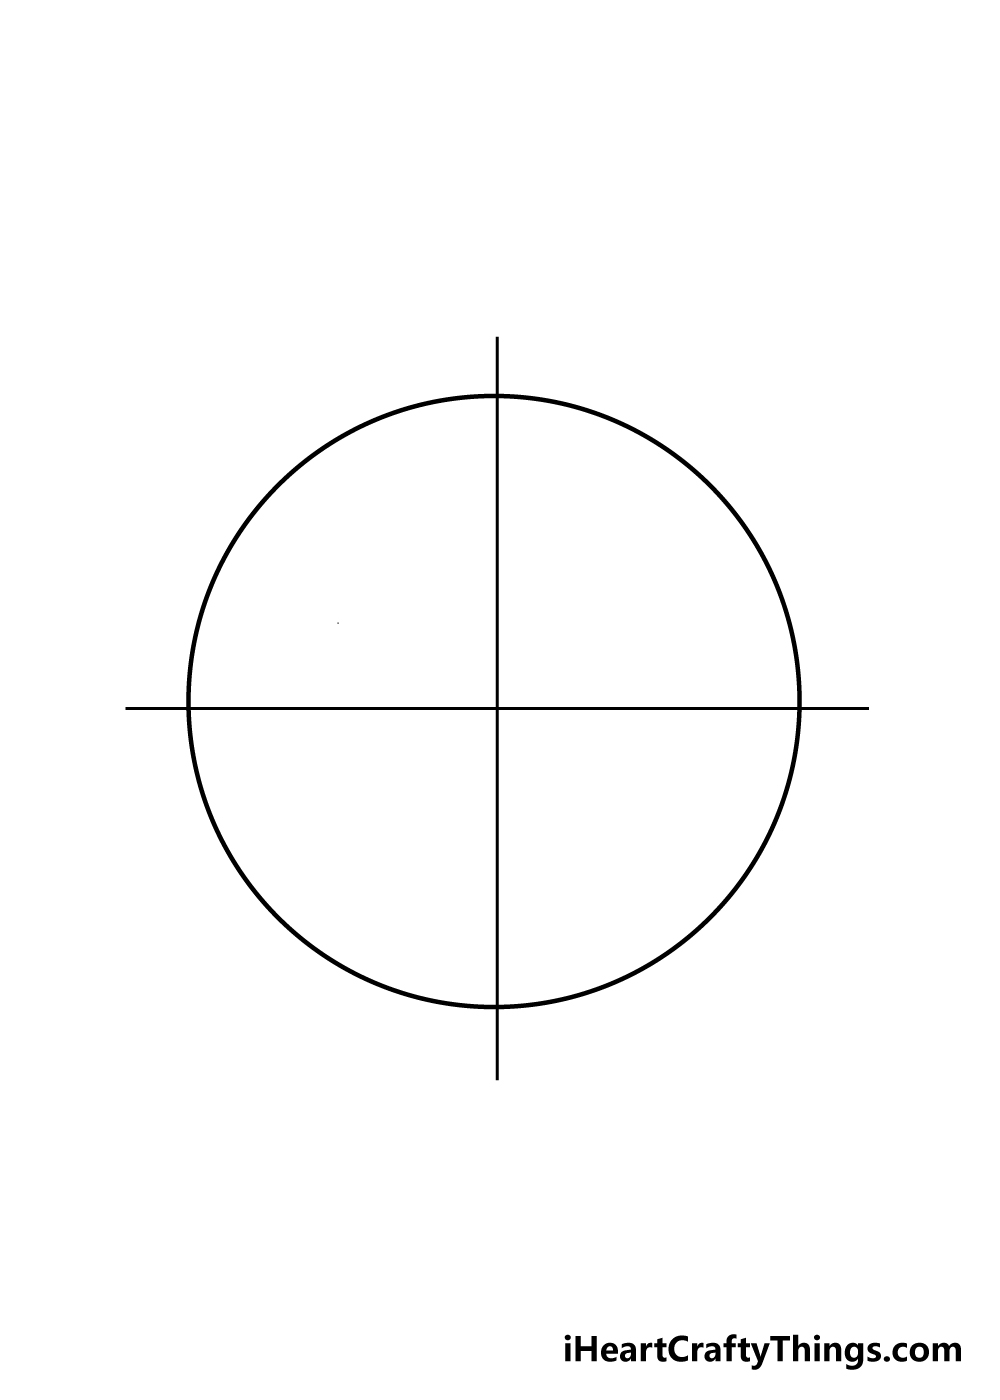 mandala drawing step 1